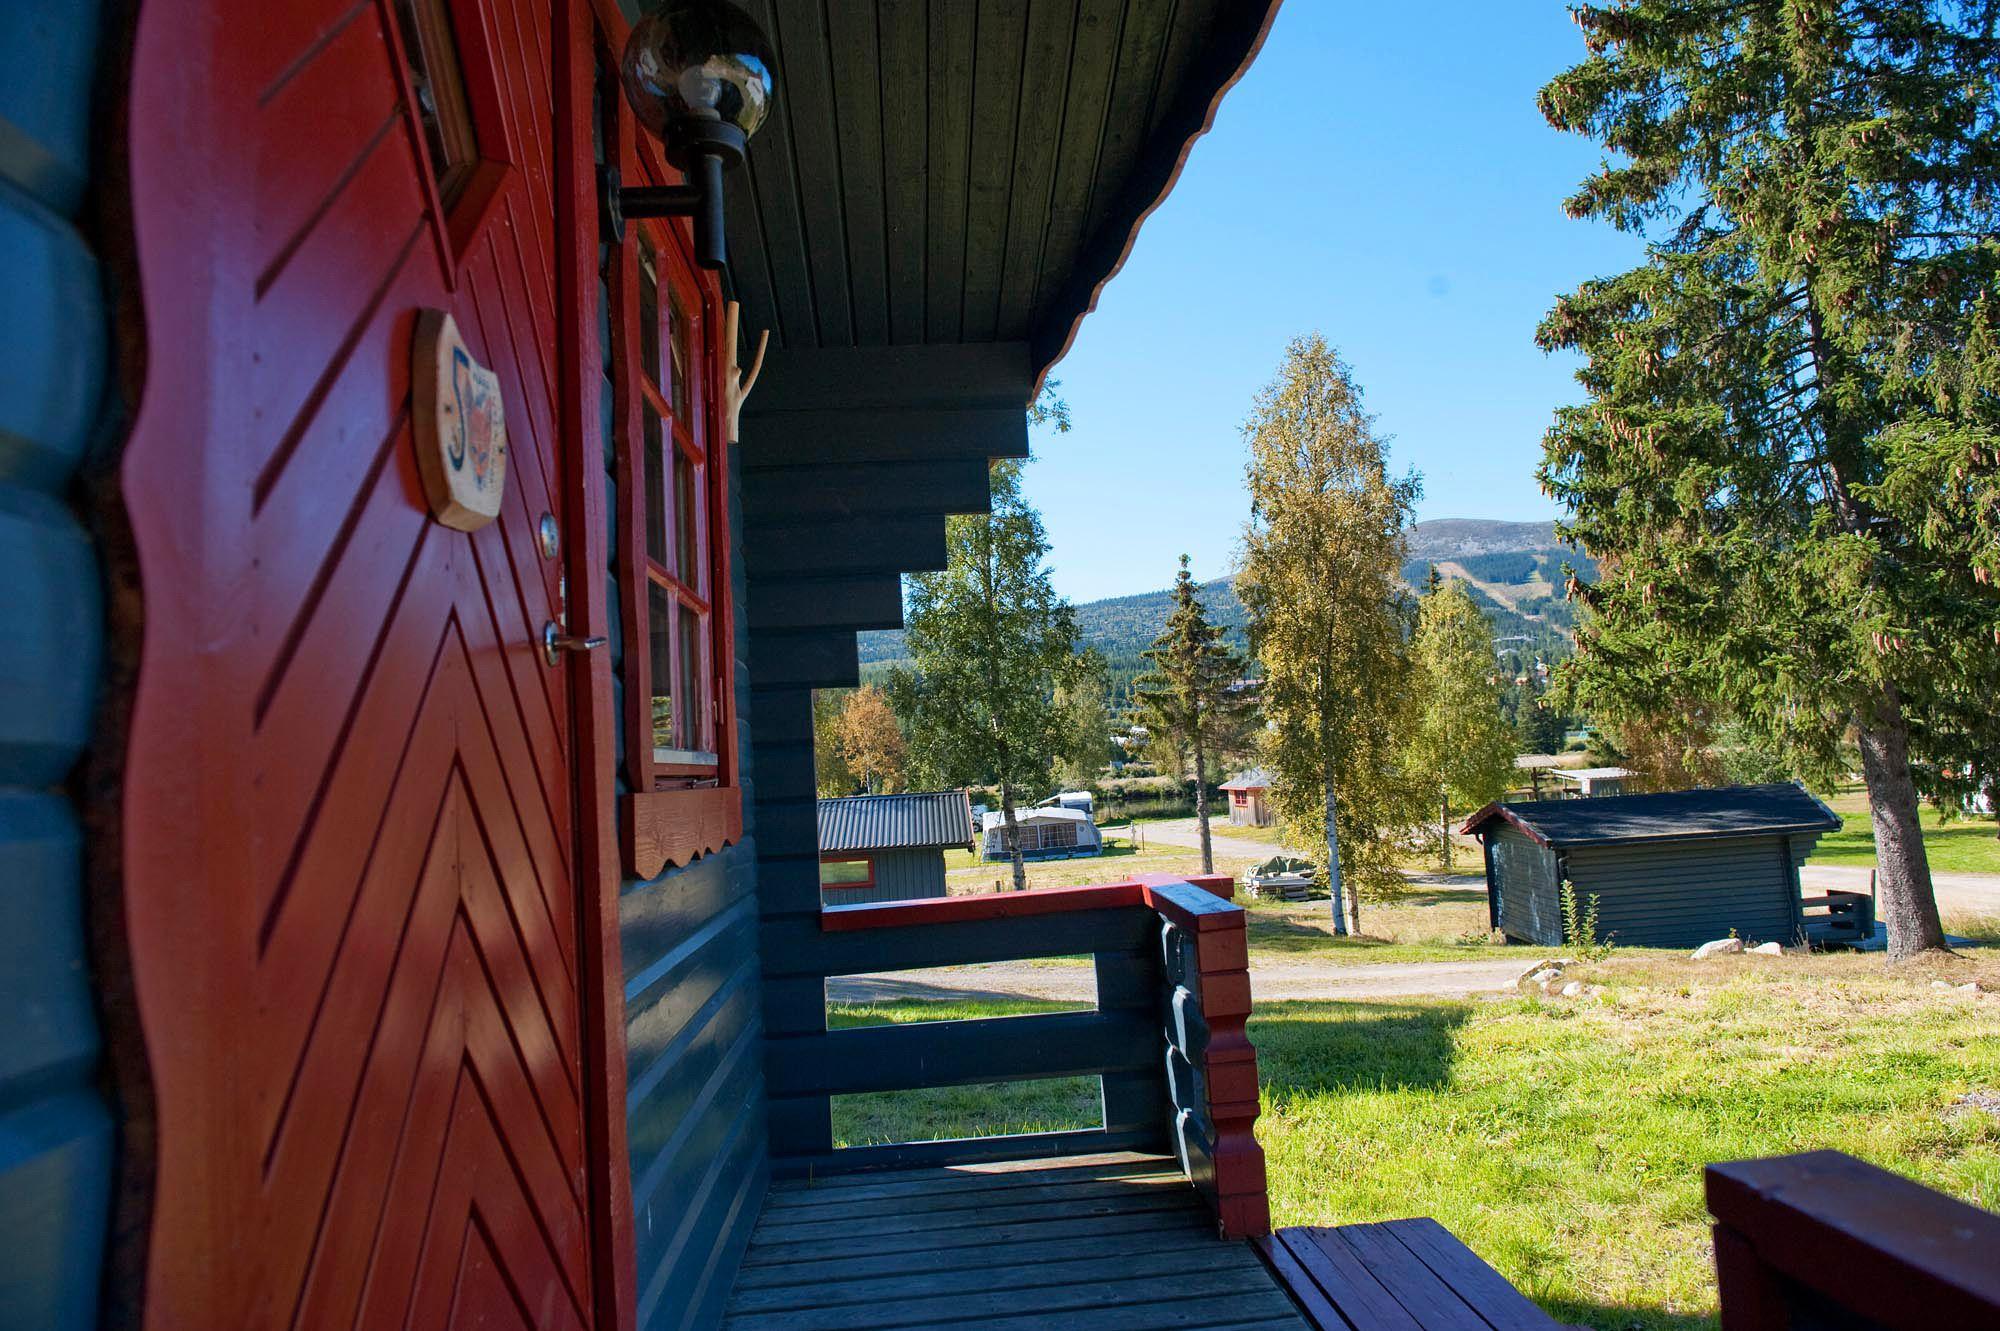 Camping cabin in Trysil - Trysilelva camping